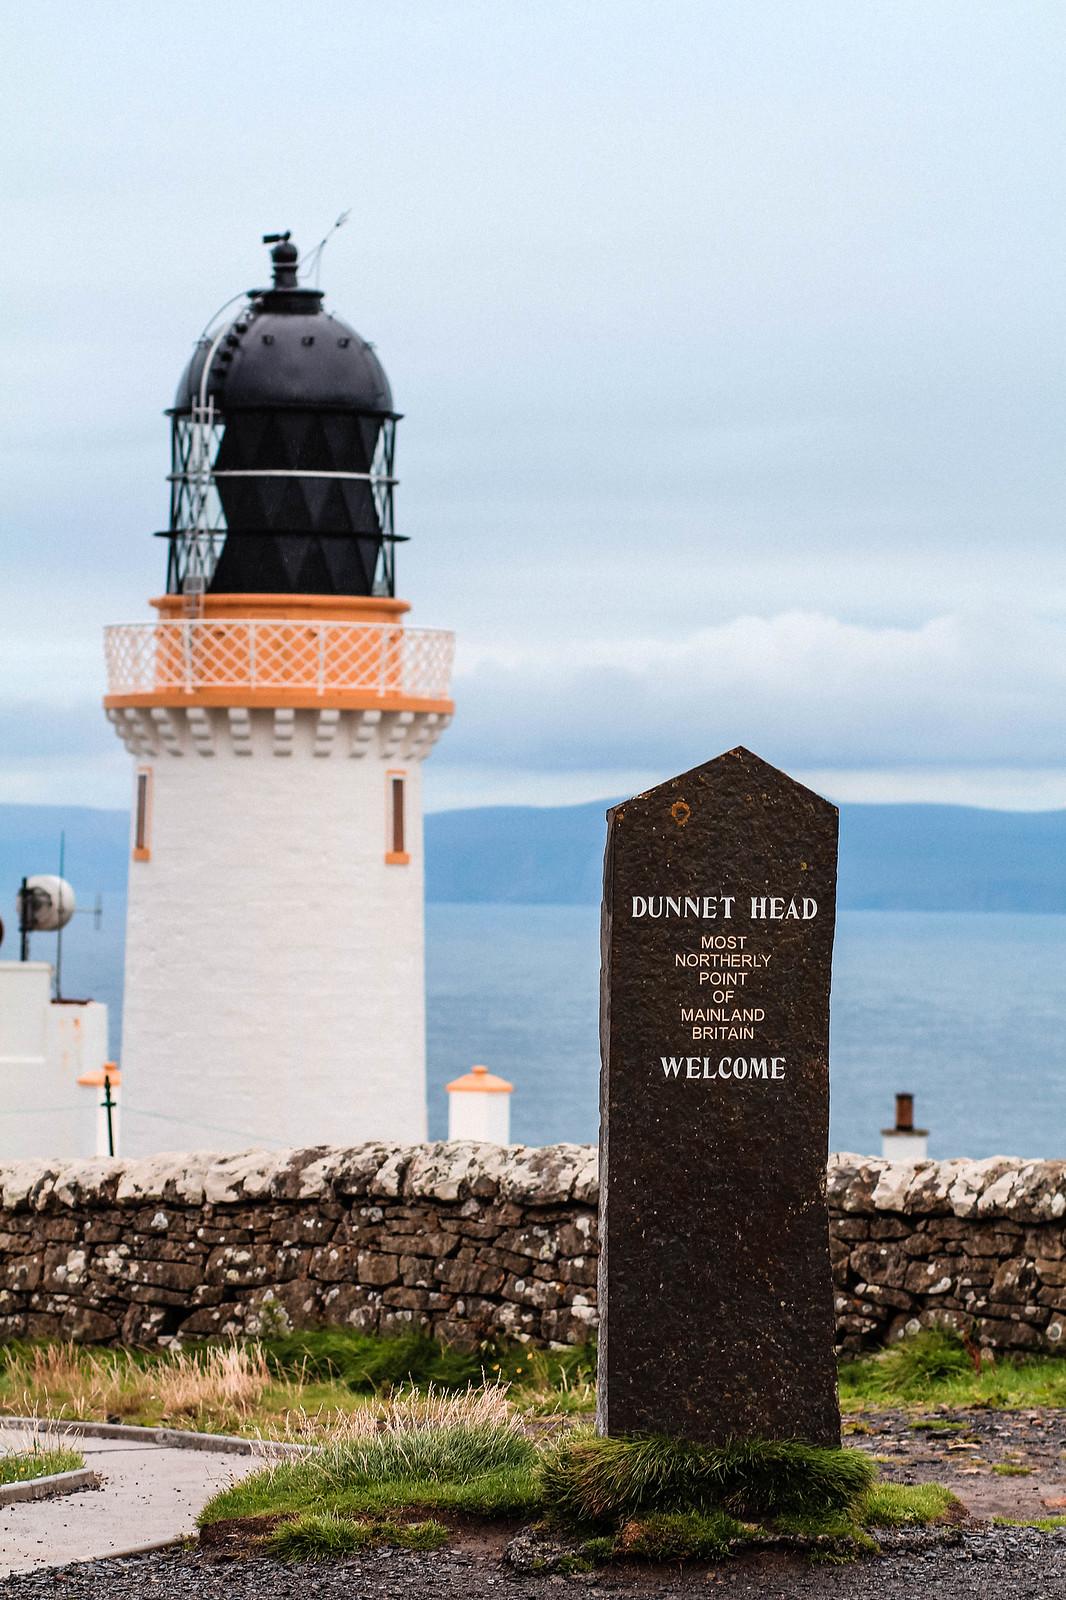 Dunnet Head Scotland NC500 travel blogger UK